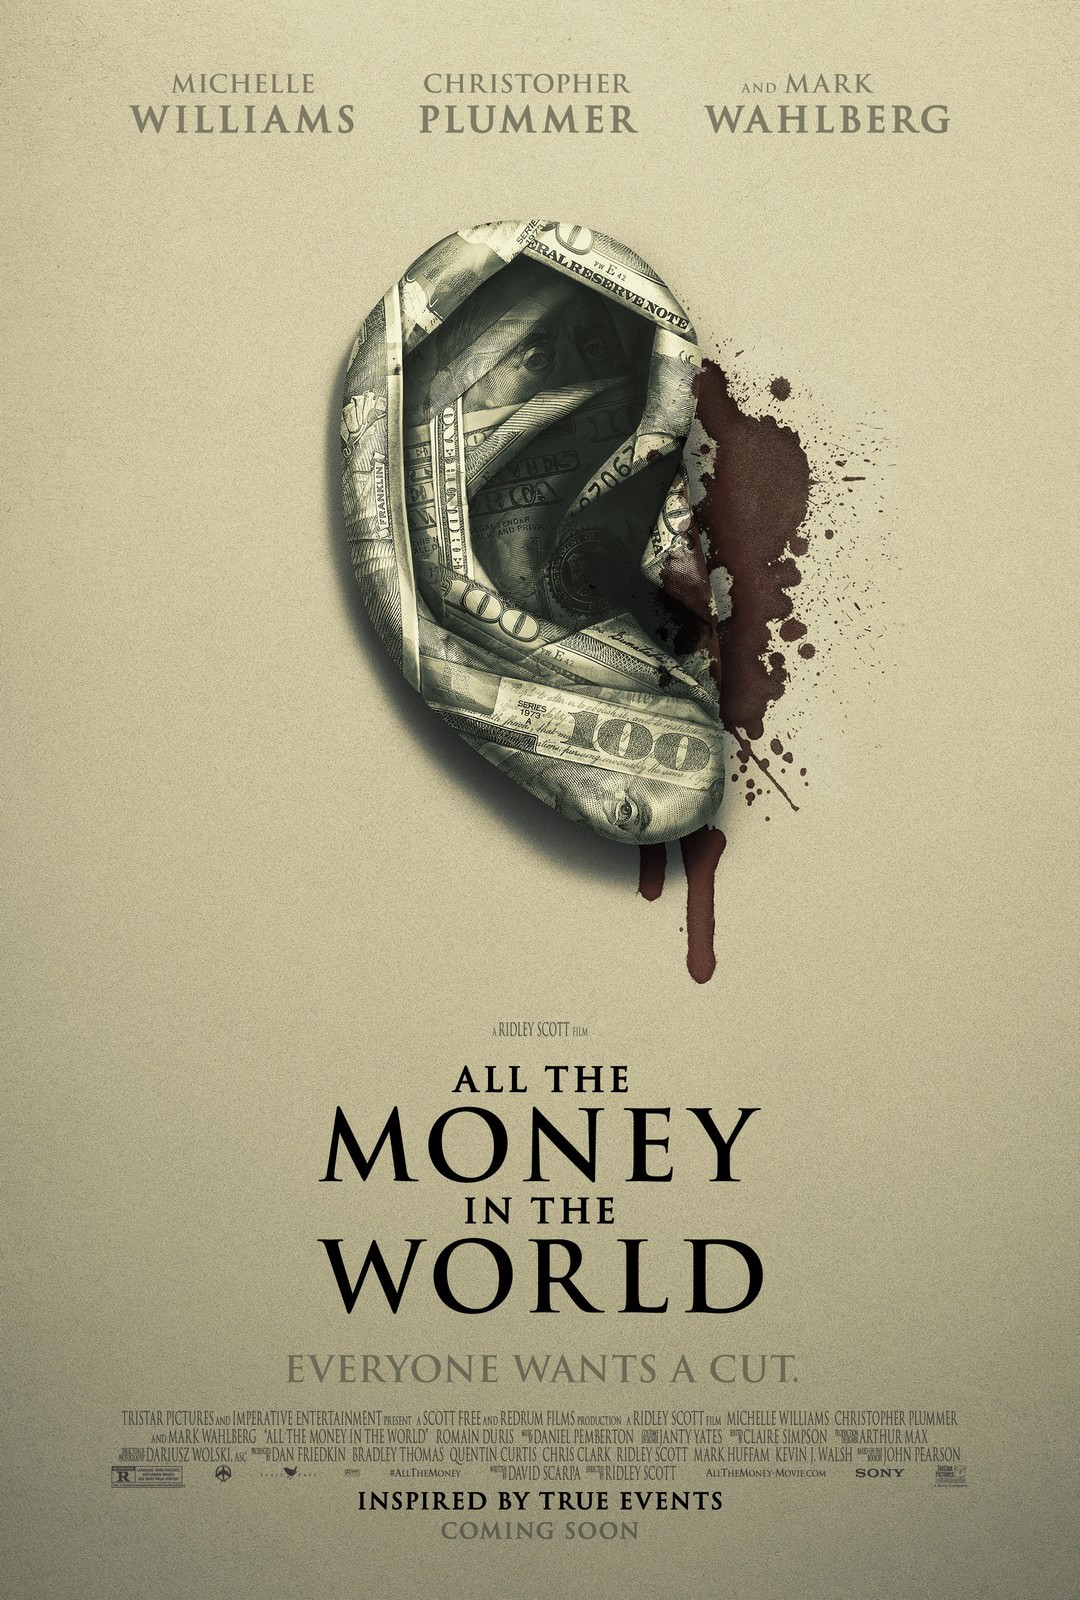 Movie, All the Money in the World(美國) / 金錢世界(台) / 金钱世界(中) / 萬惡金錢(港), 電影海報, 美國, 預告